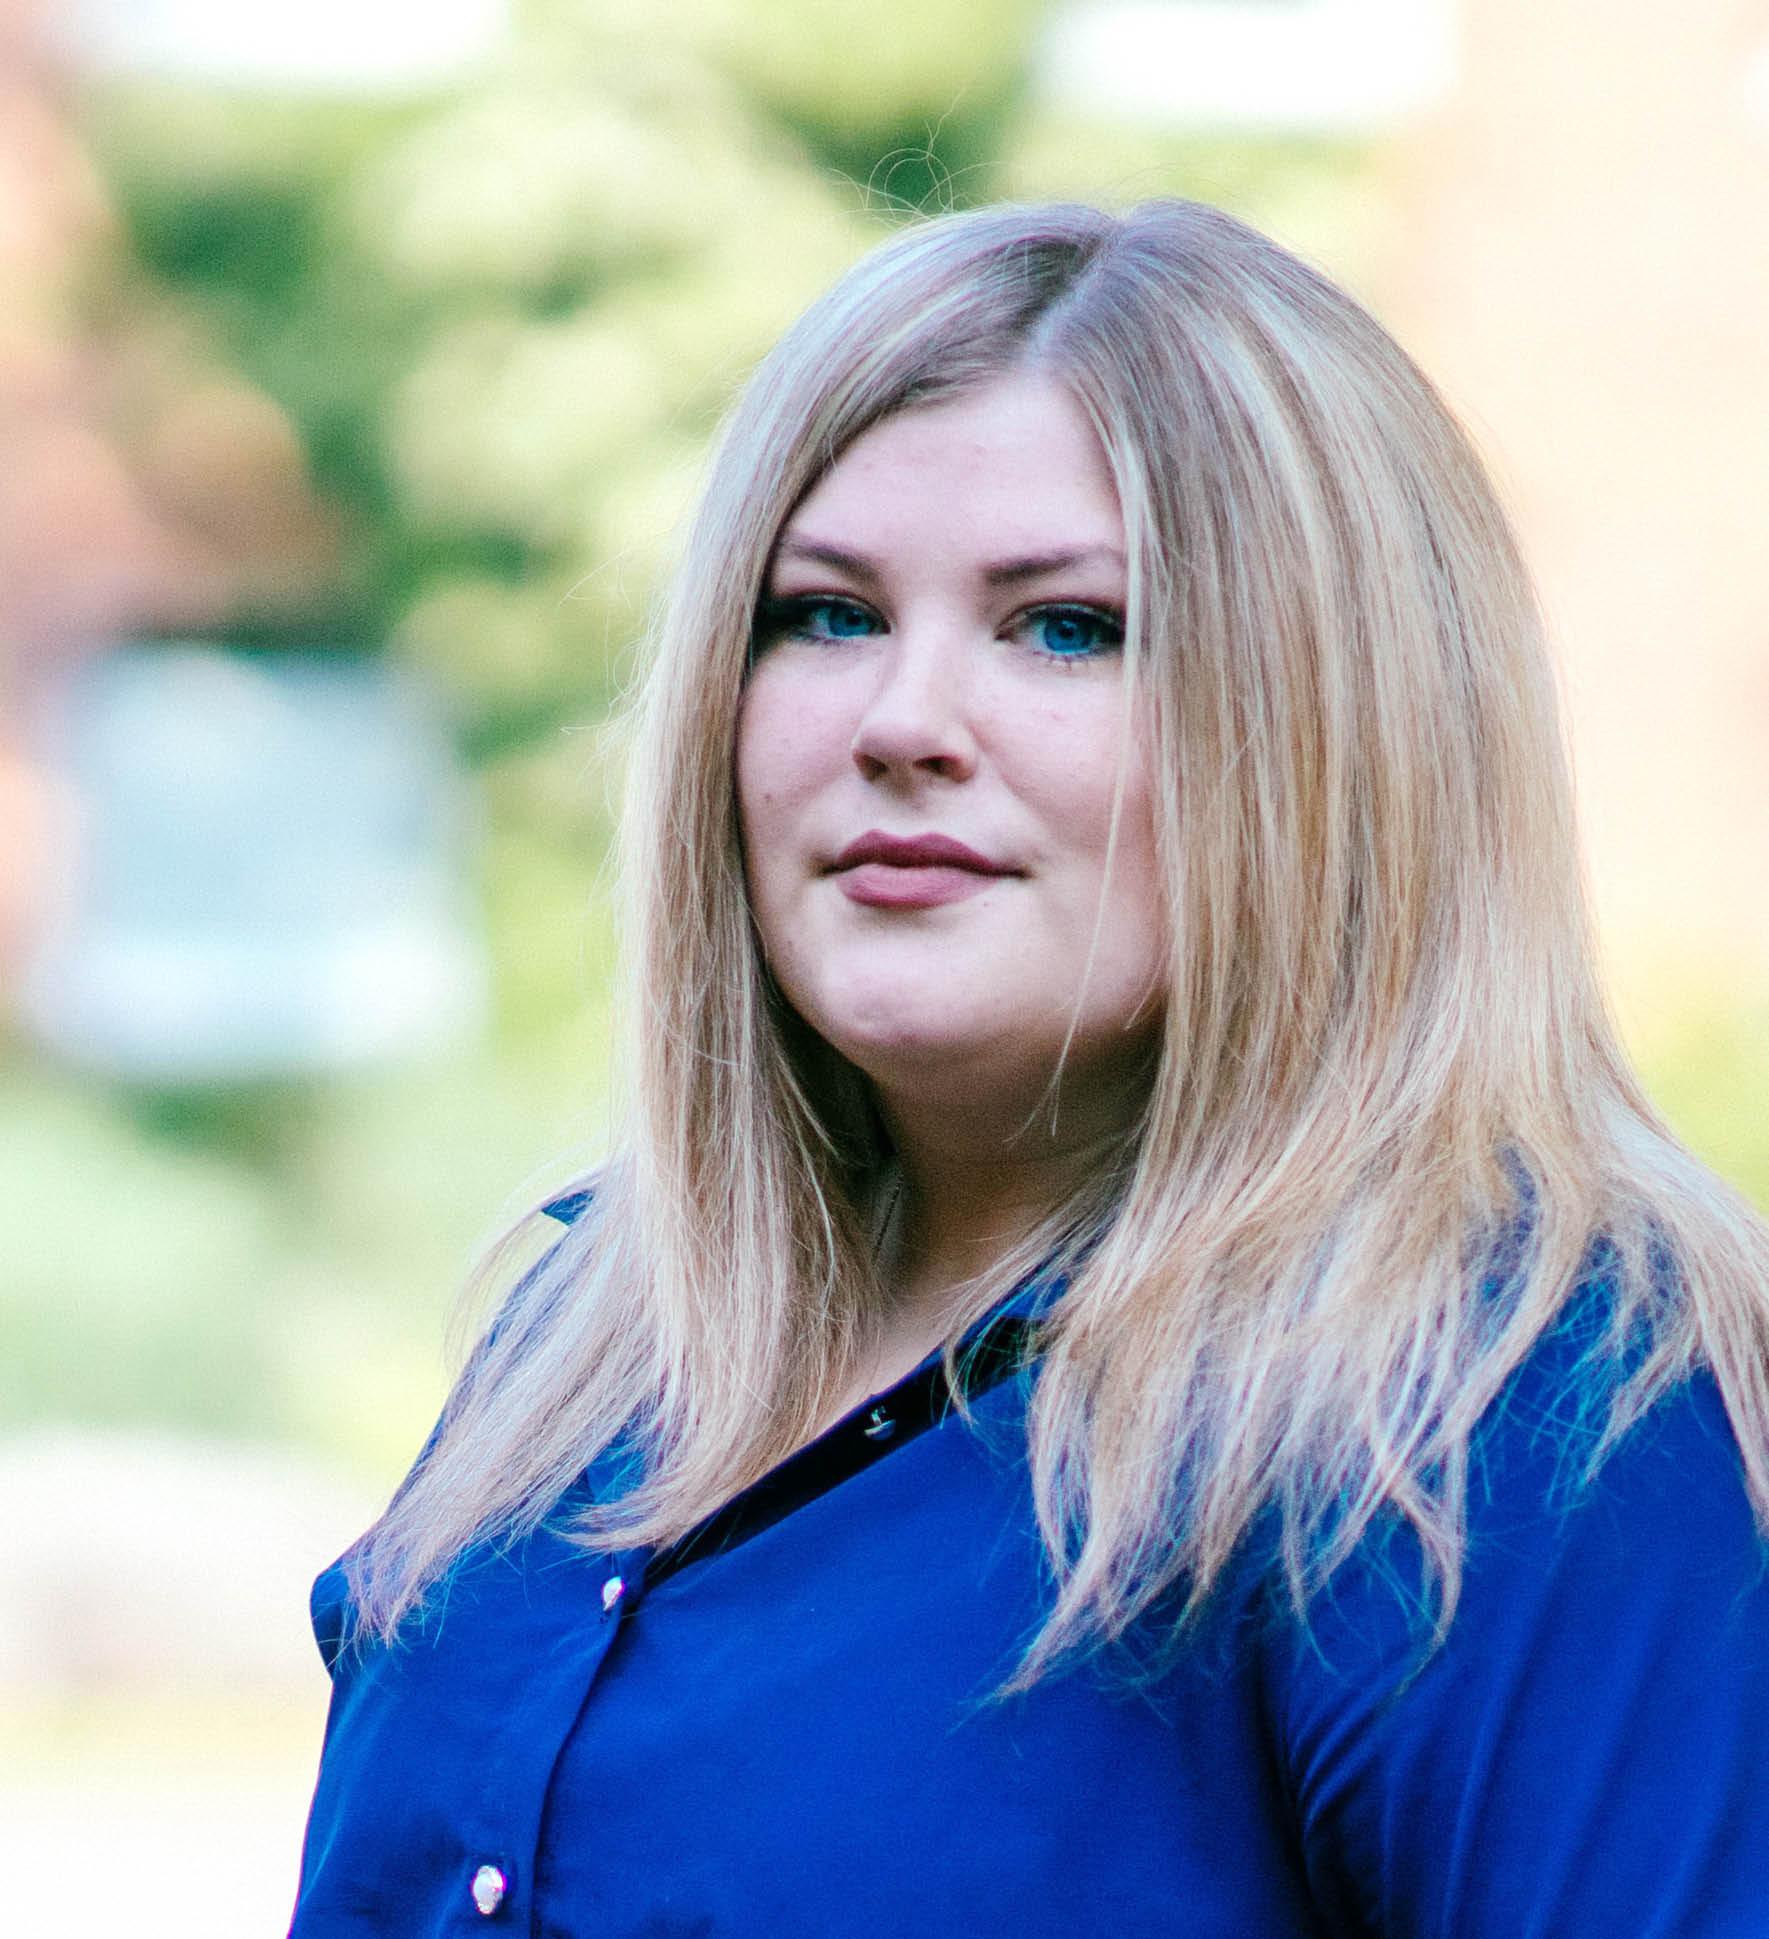 Sarah Ebernickel